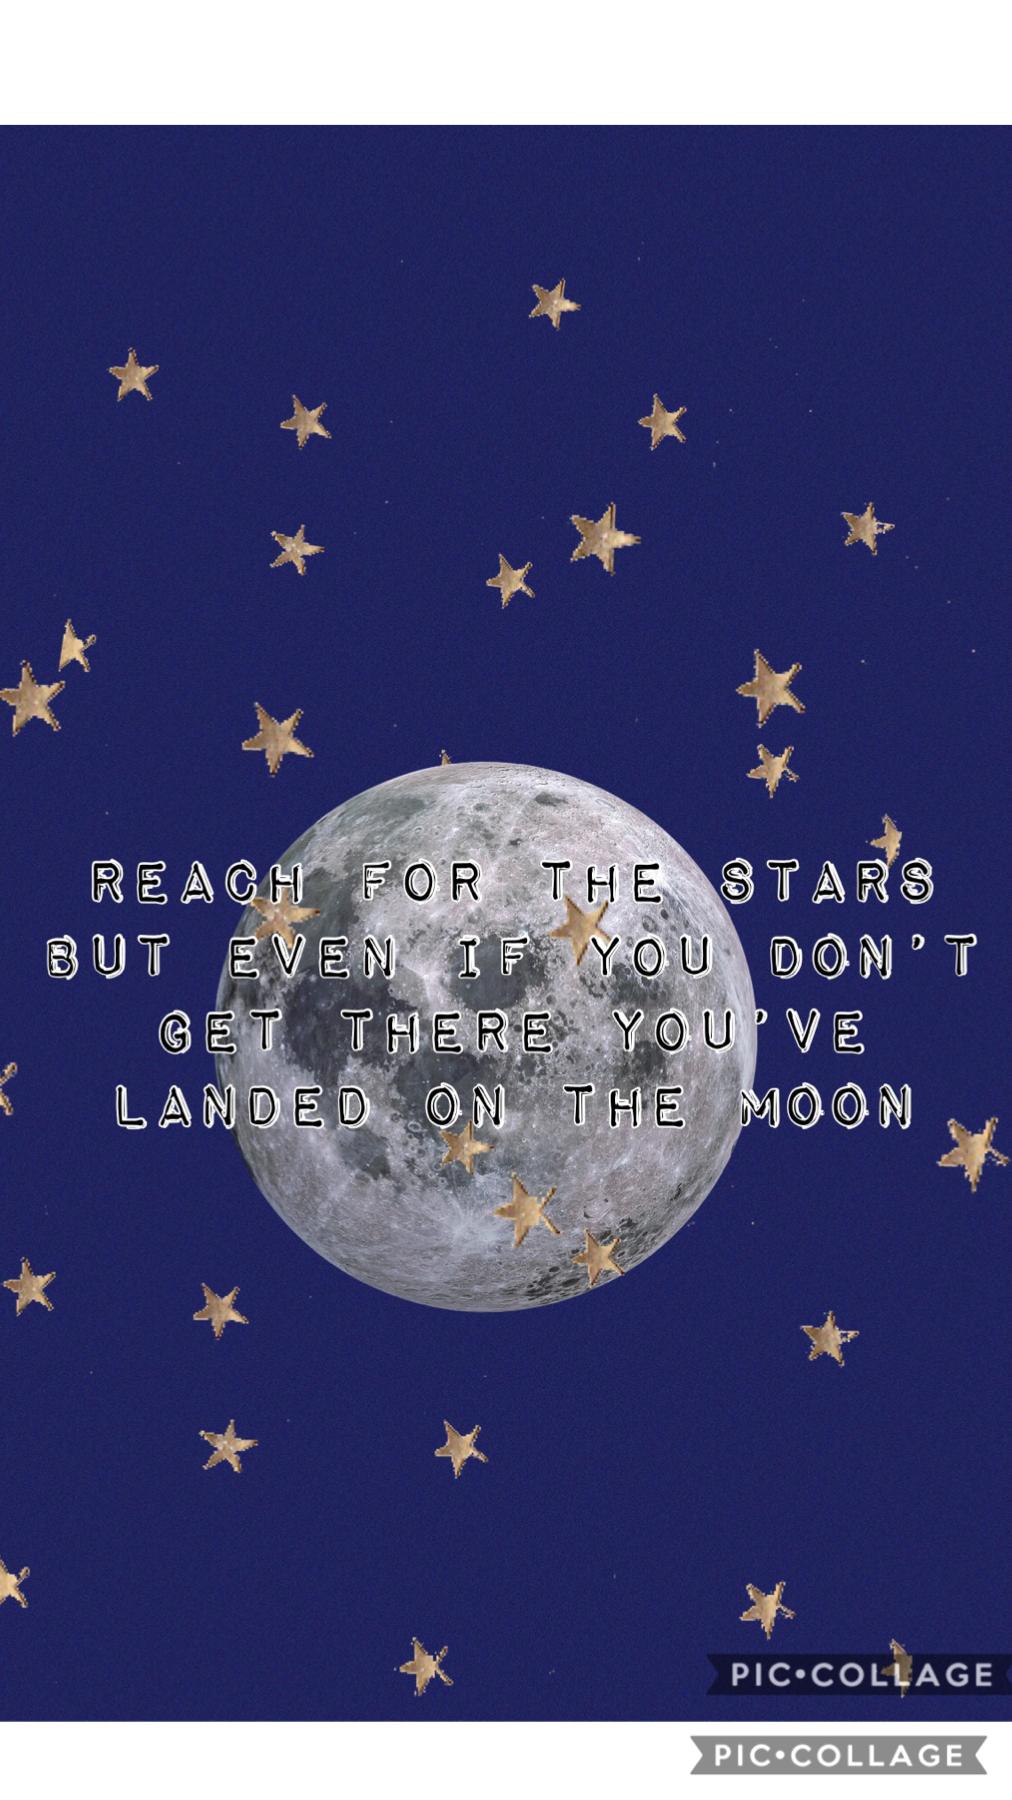 So reach for the stars